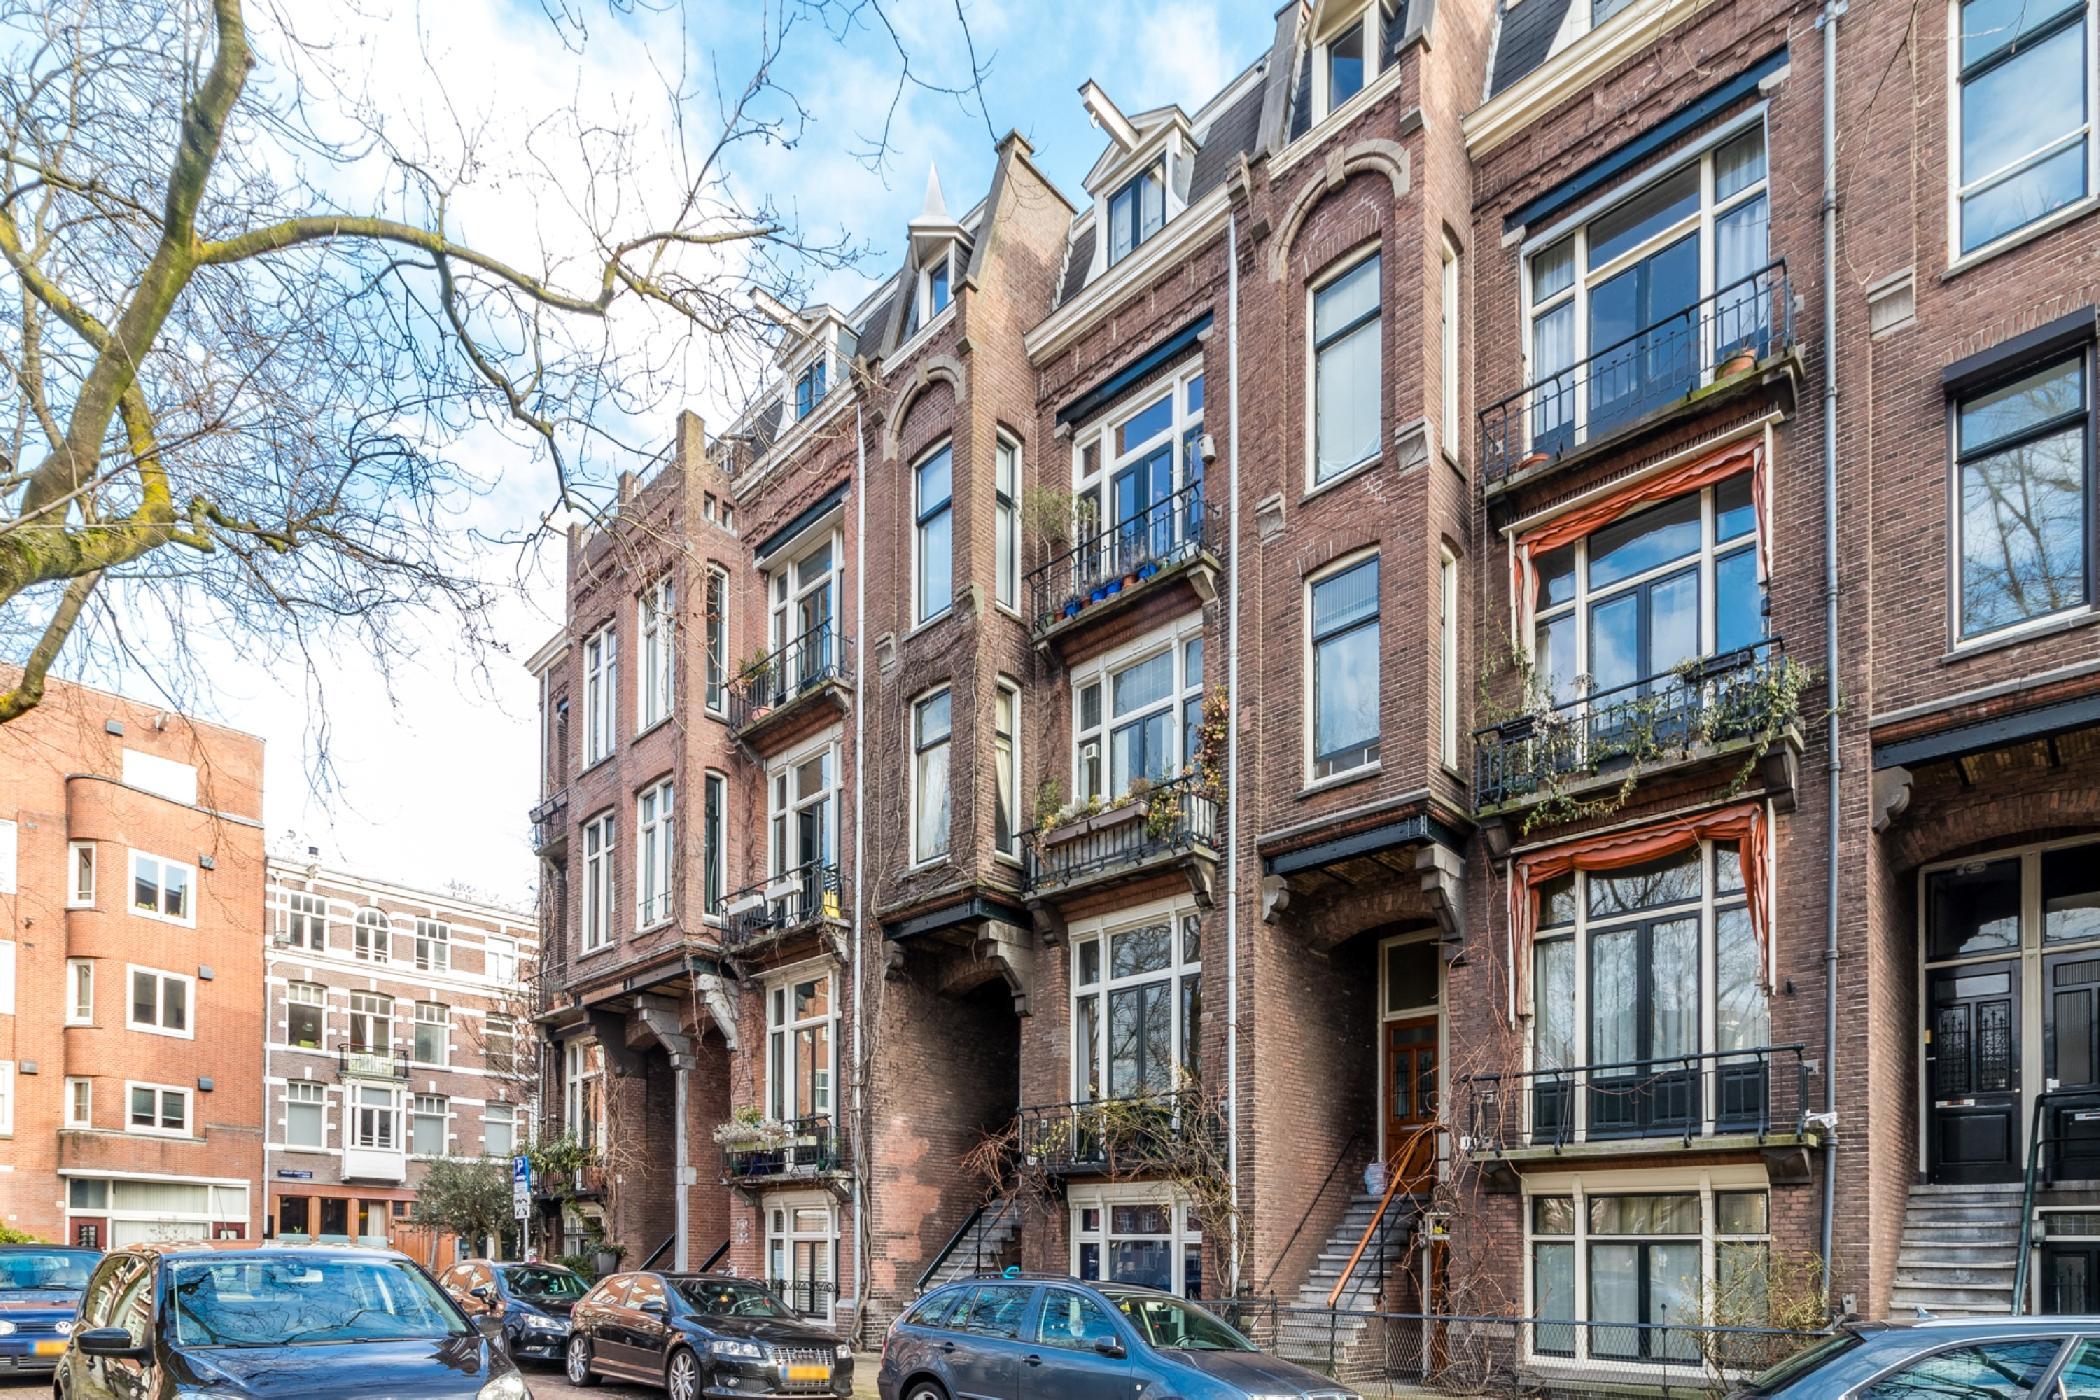 2018 03 07 - bookingmanager - hartplein 17-3 te amsterdam  1 of 31  jpg